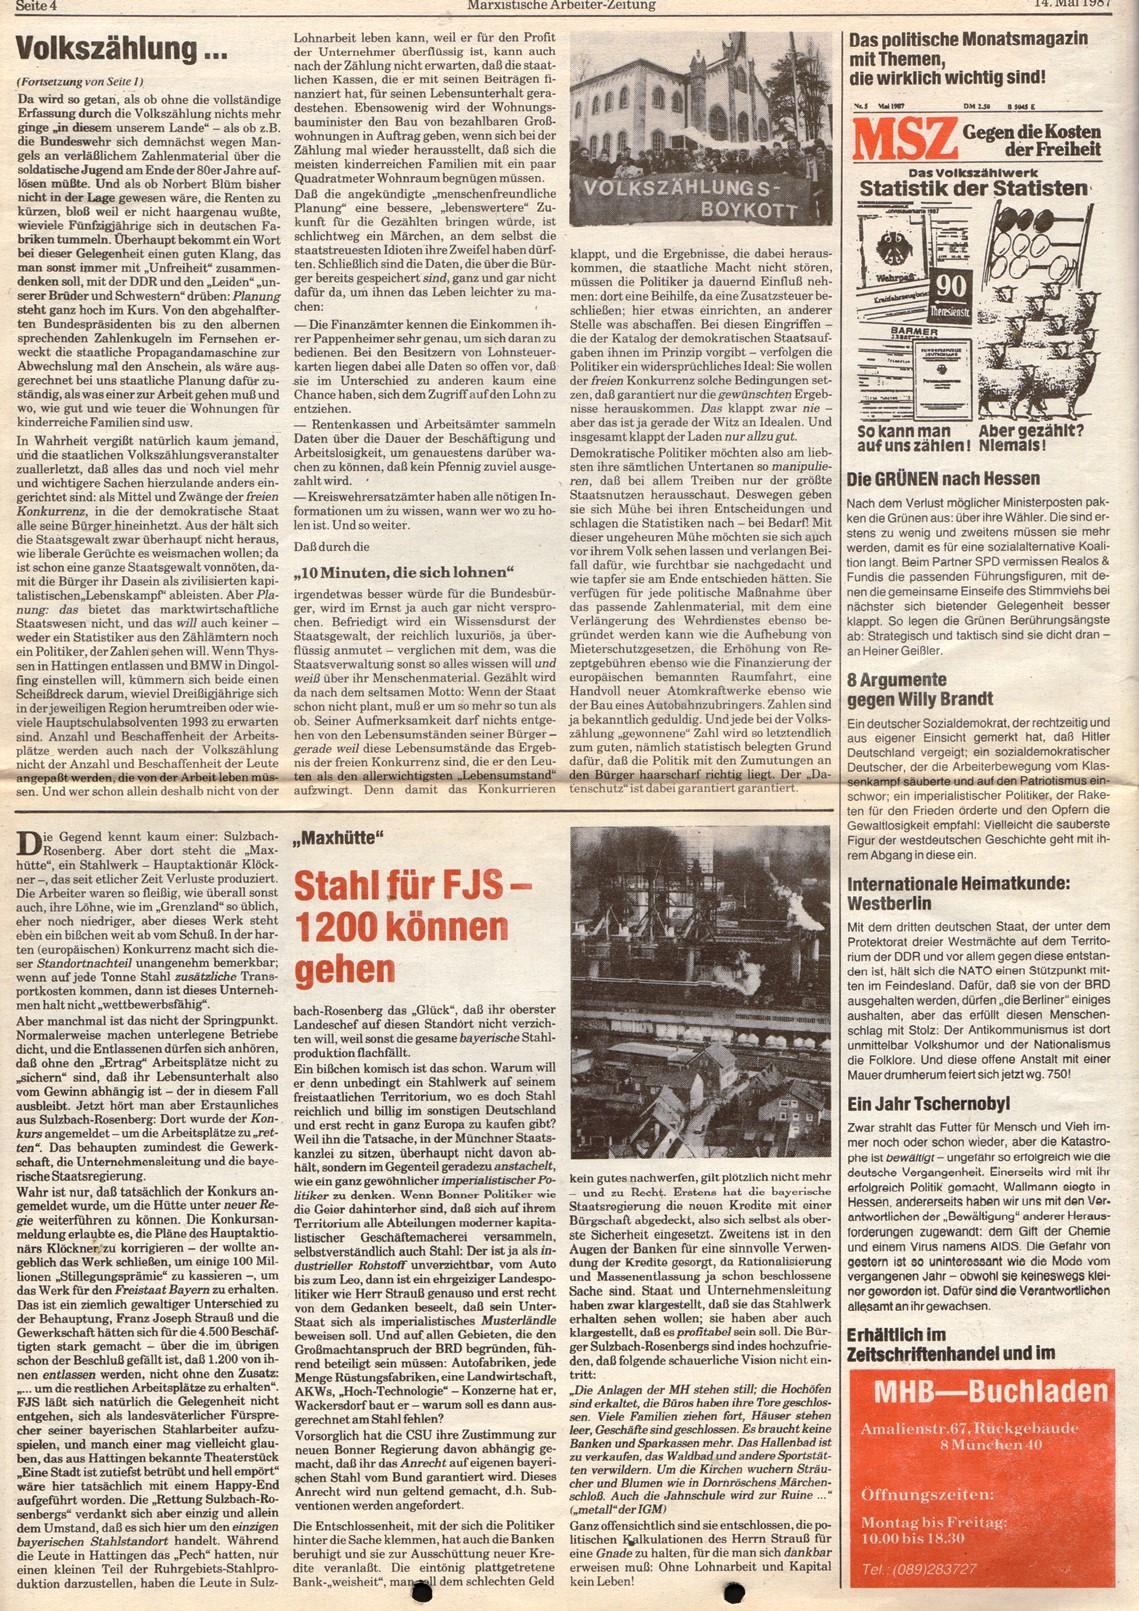 Muenchen_MG_MAZ_19870514_04